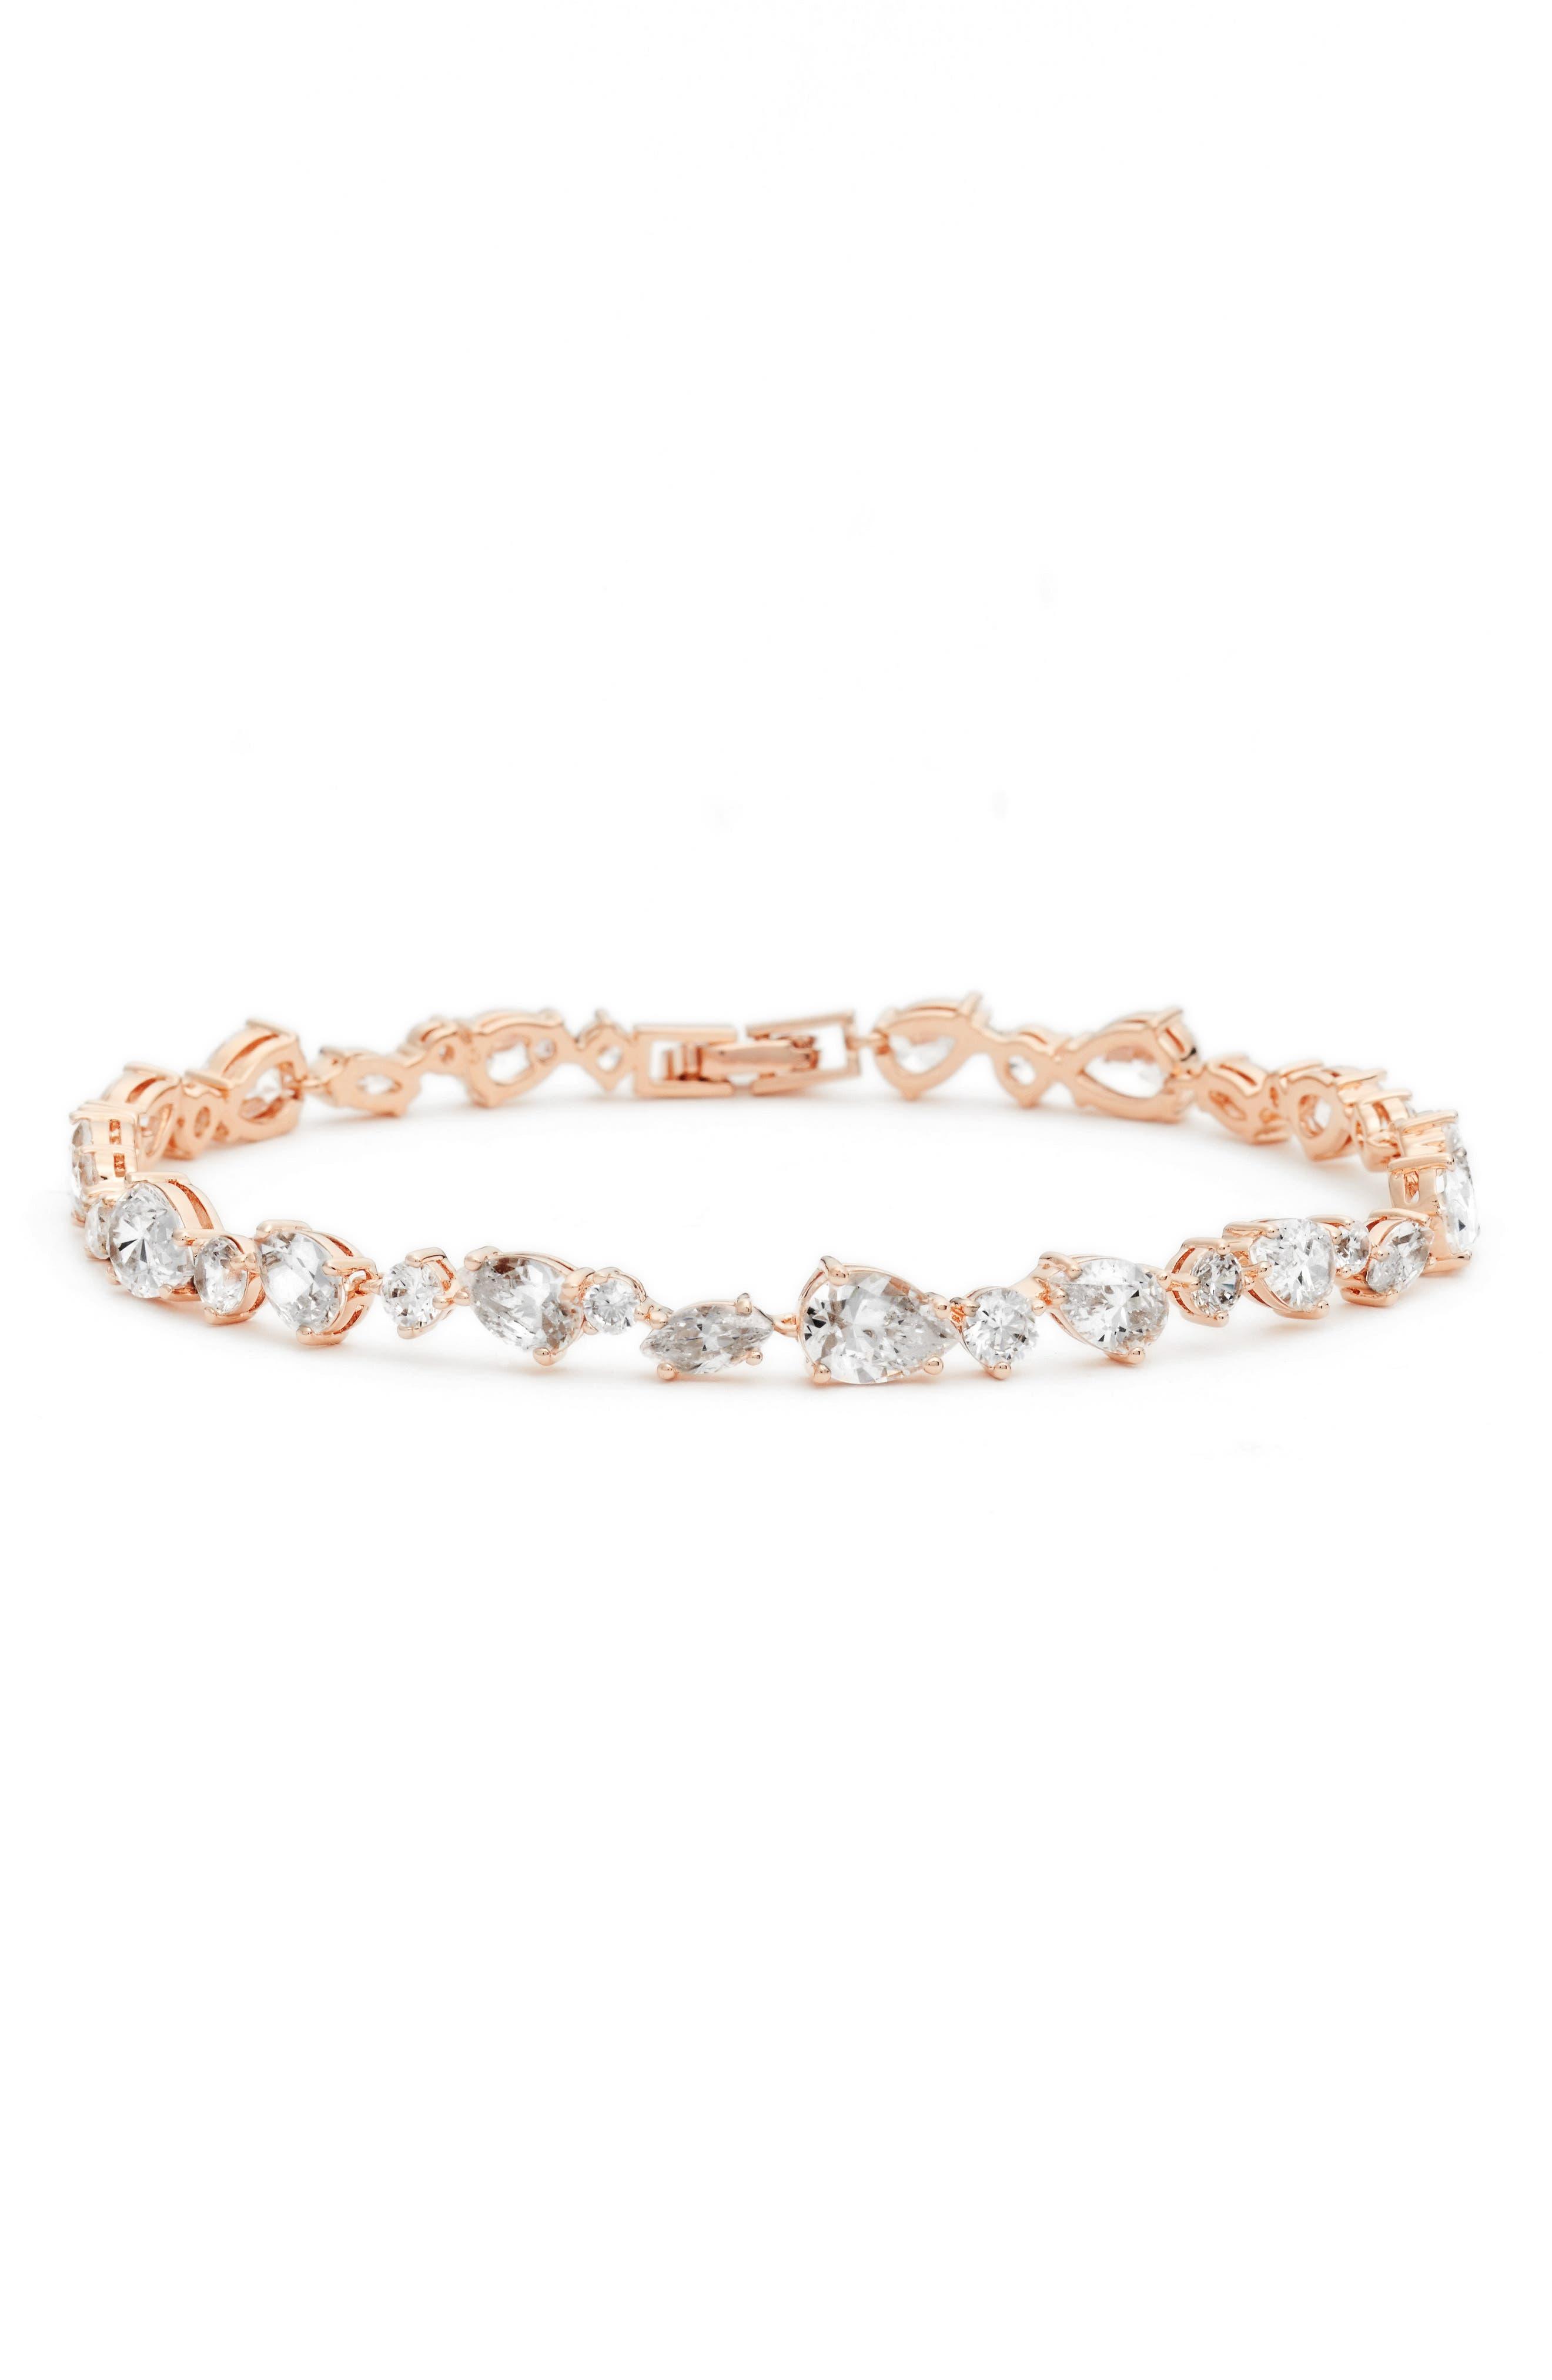 Ava Line Bracelet,                             Main thumbnail 1, color,                             ROSE GOLD